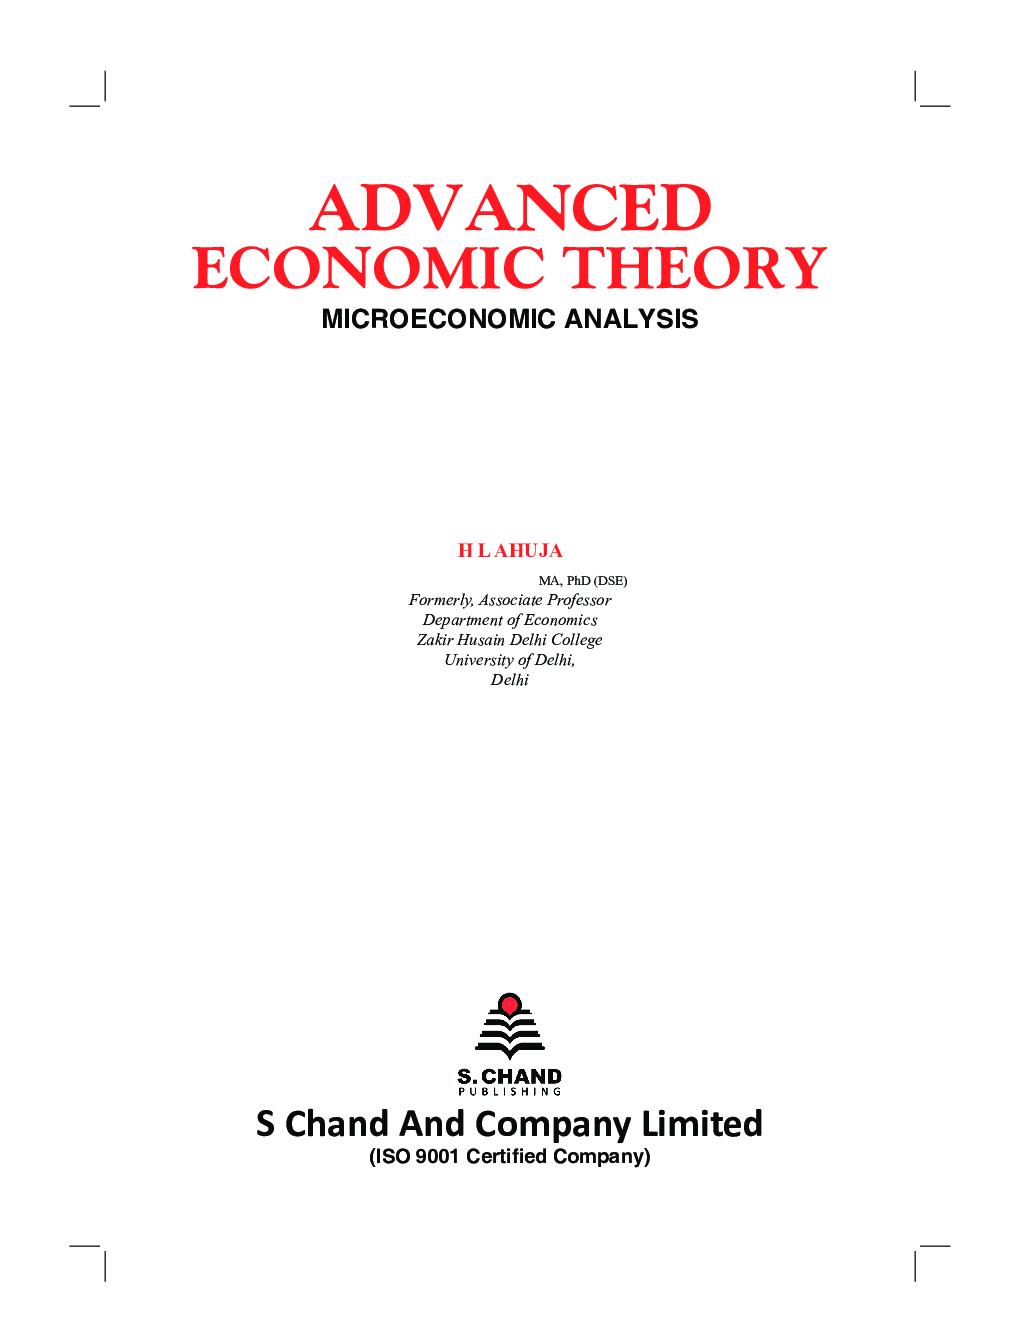 Advanced Economic Theory (Microeconomic Analysis) - Page 2